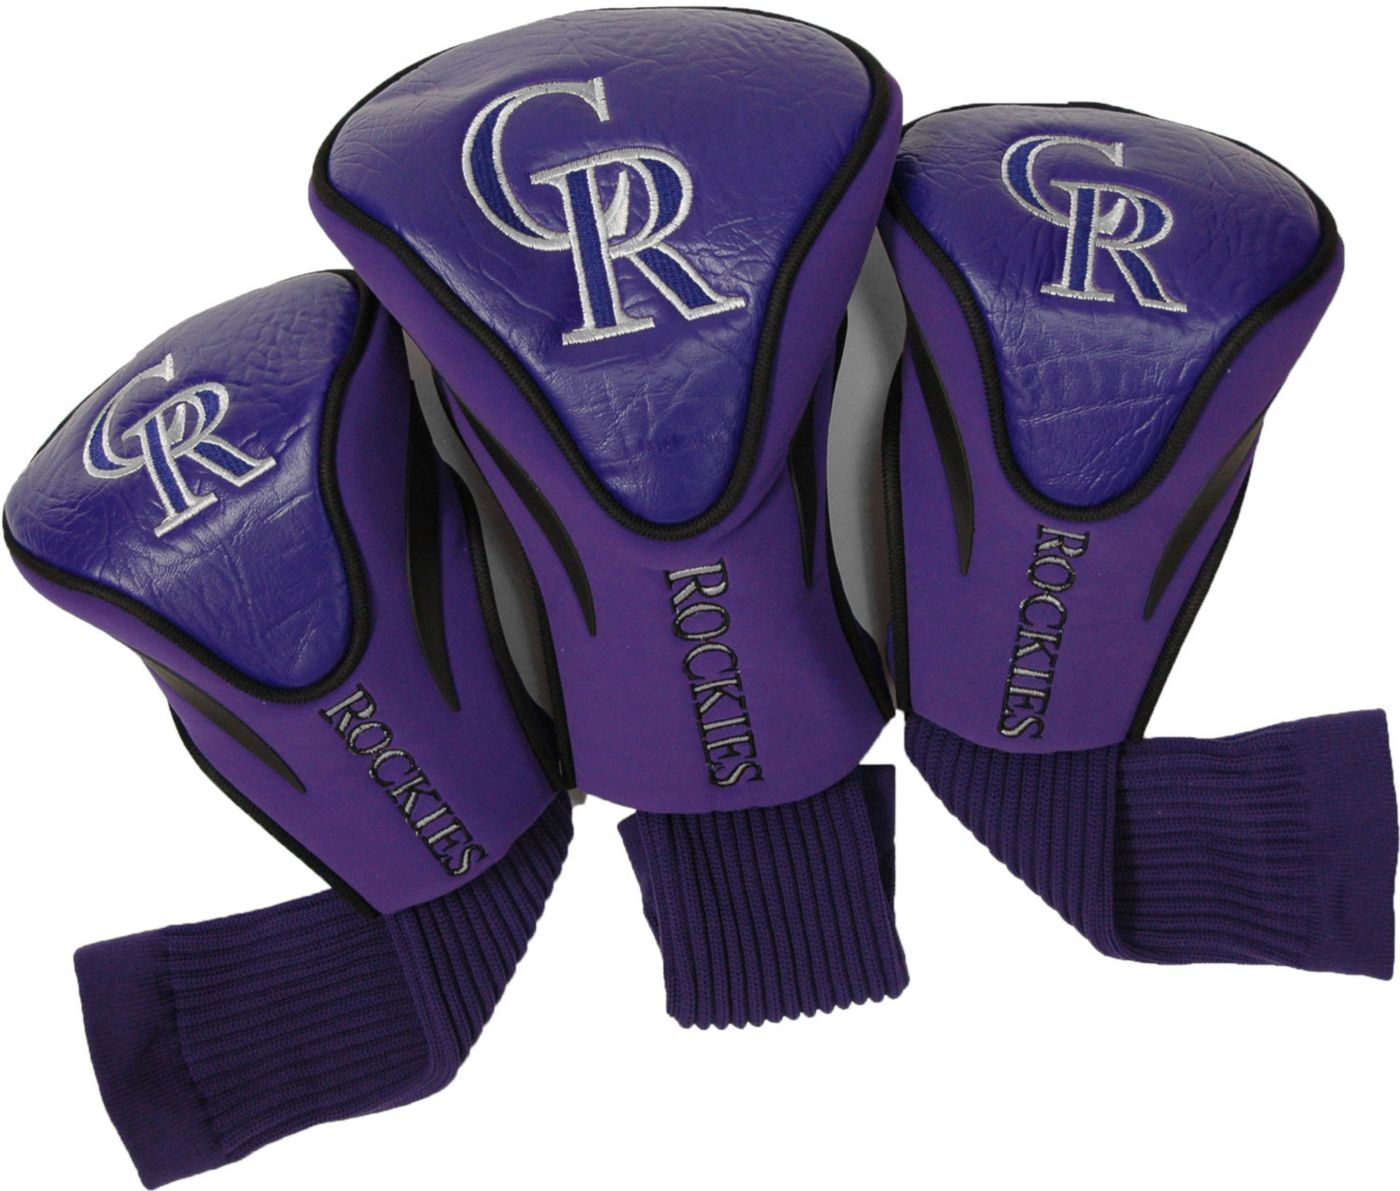 Team Golf Colorado Rockies Contour Sock Headcovers - 3 Pack